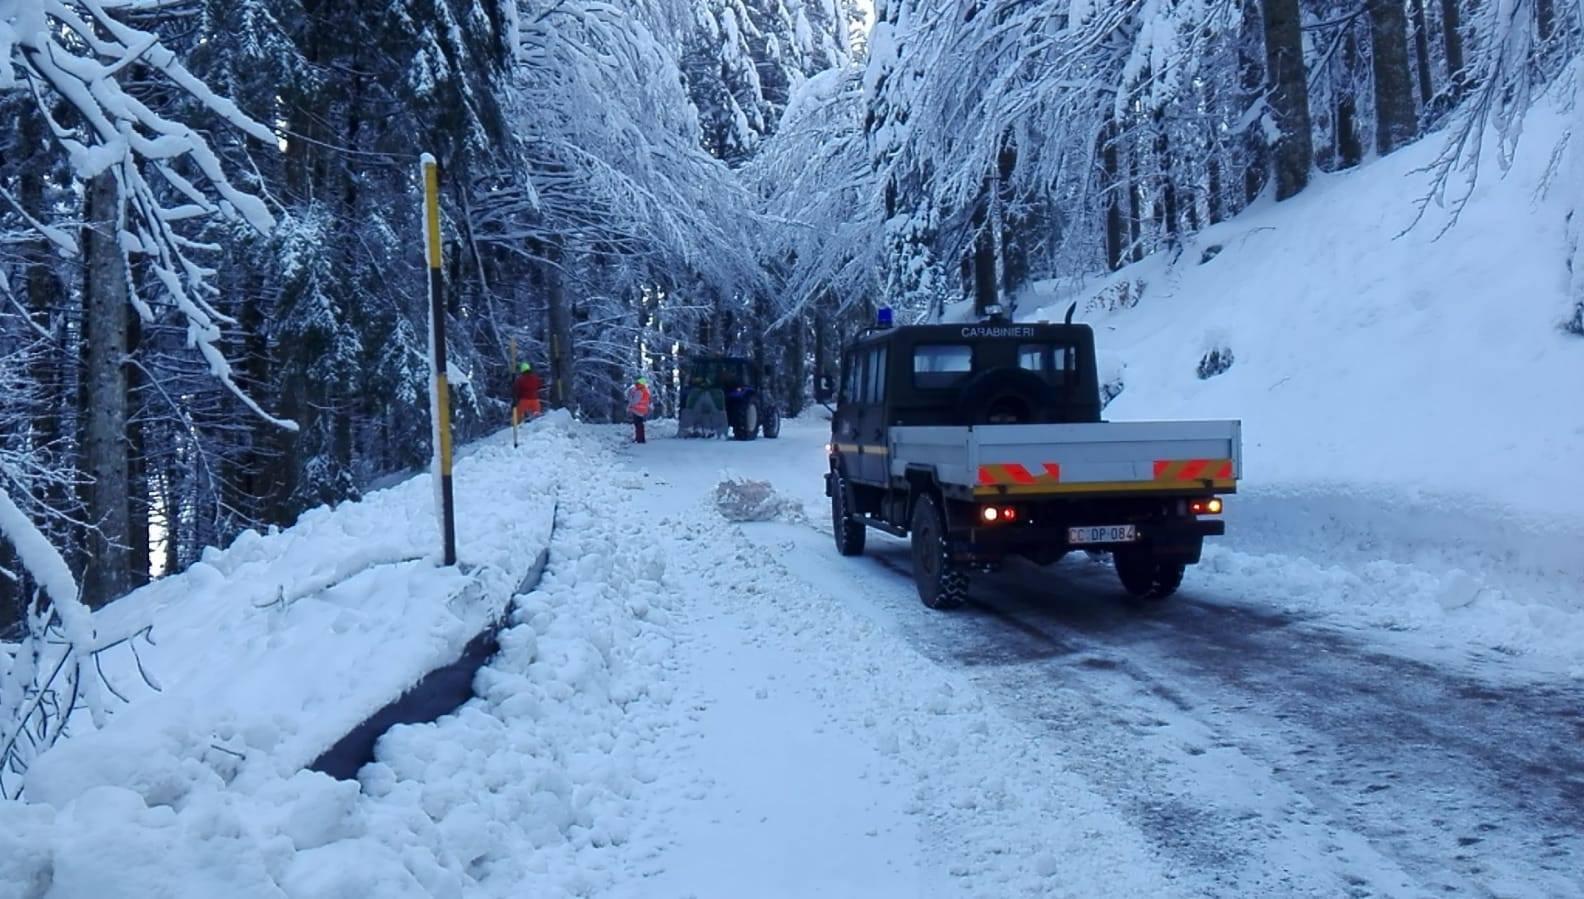 Chiusura-per-neve-e-caduta-alberi-SP4